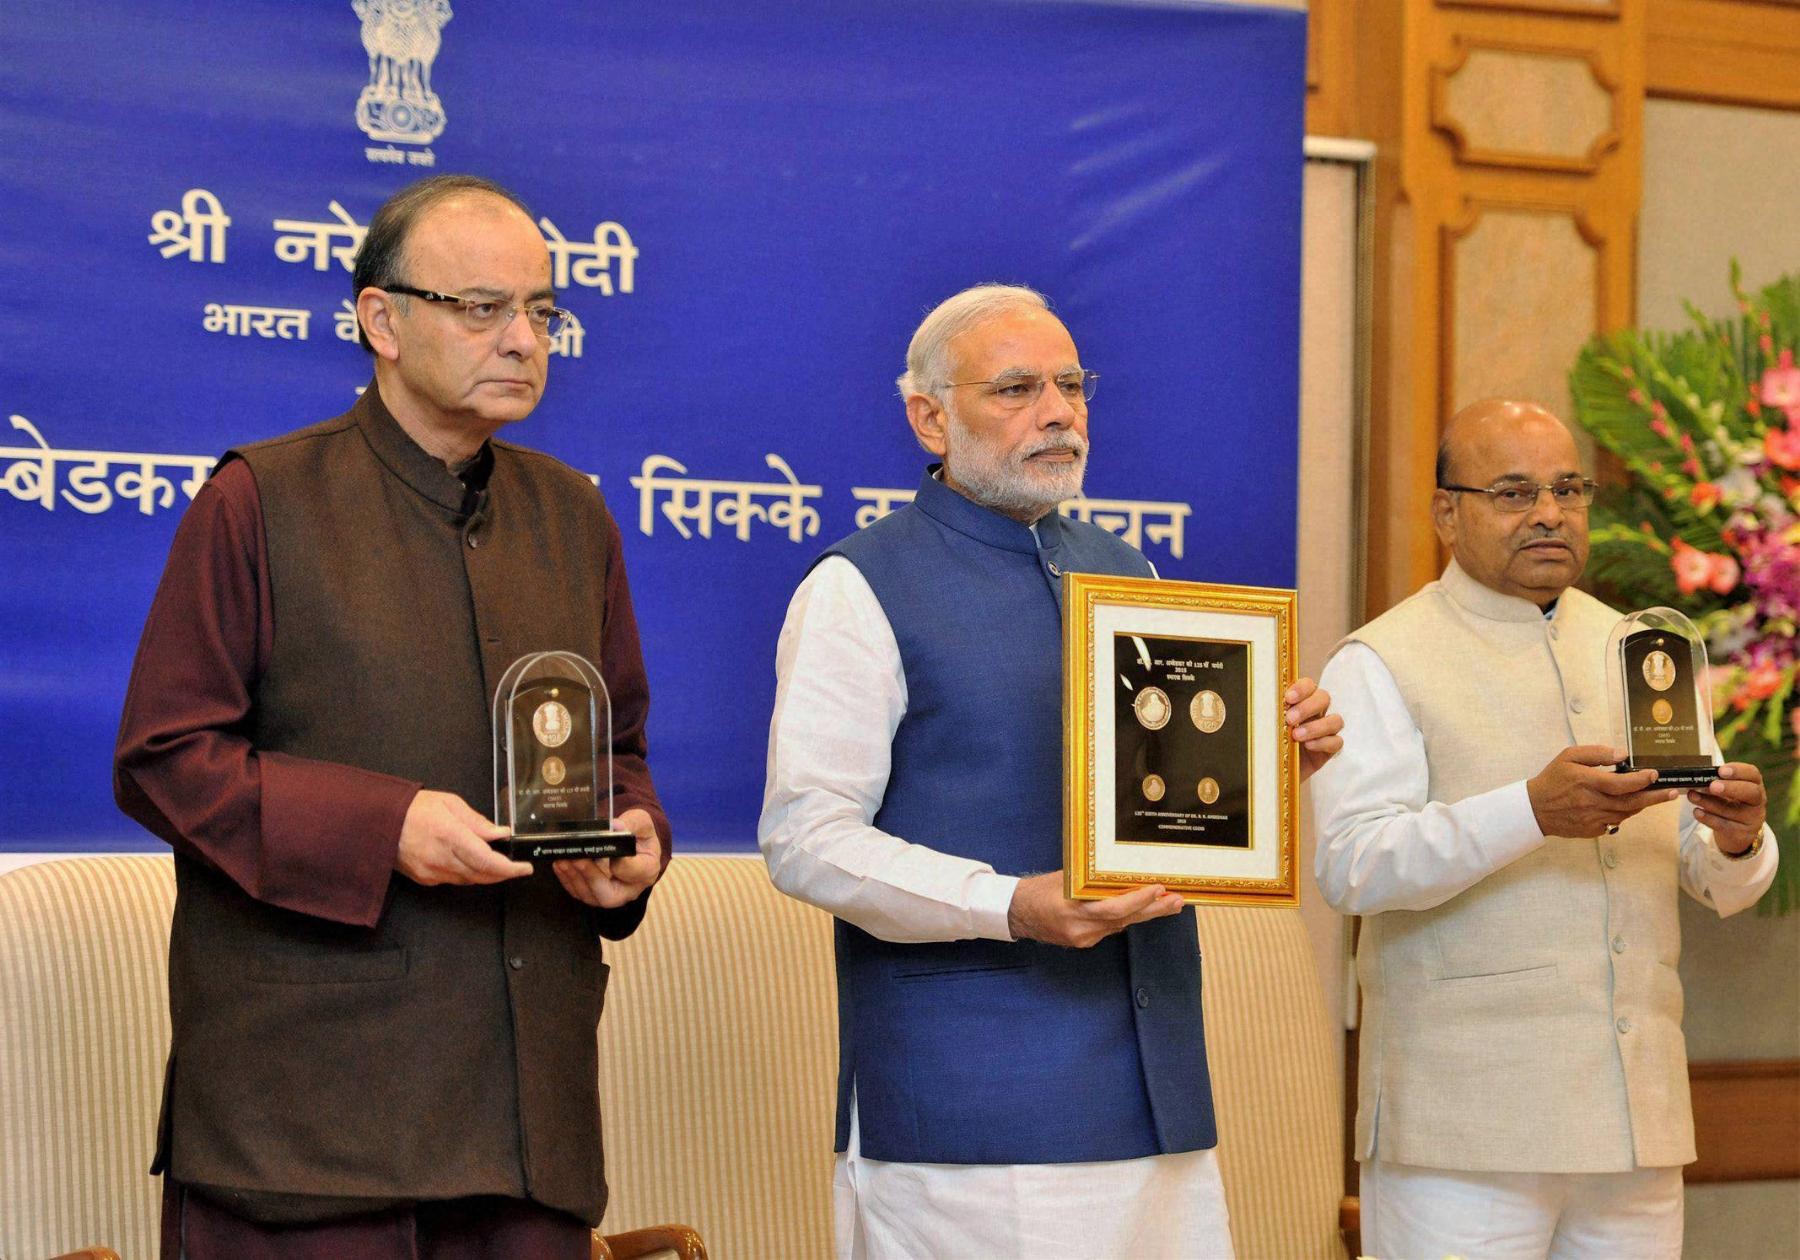 Modi vows to fulfil Ambedkar's vision of inclusive India